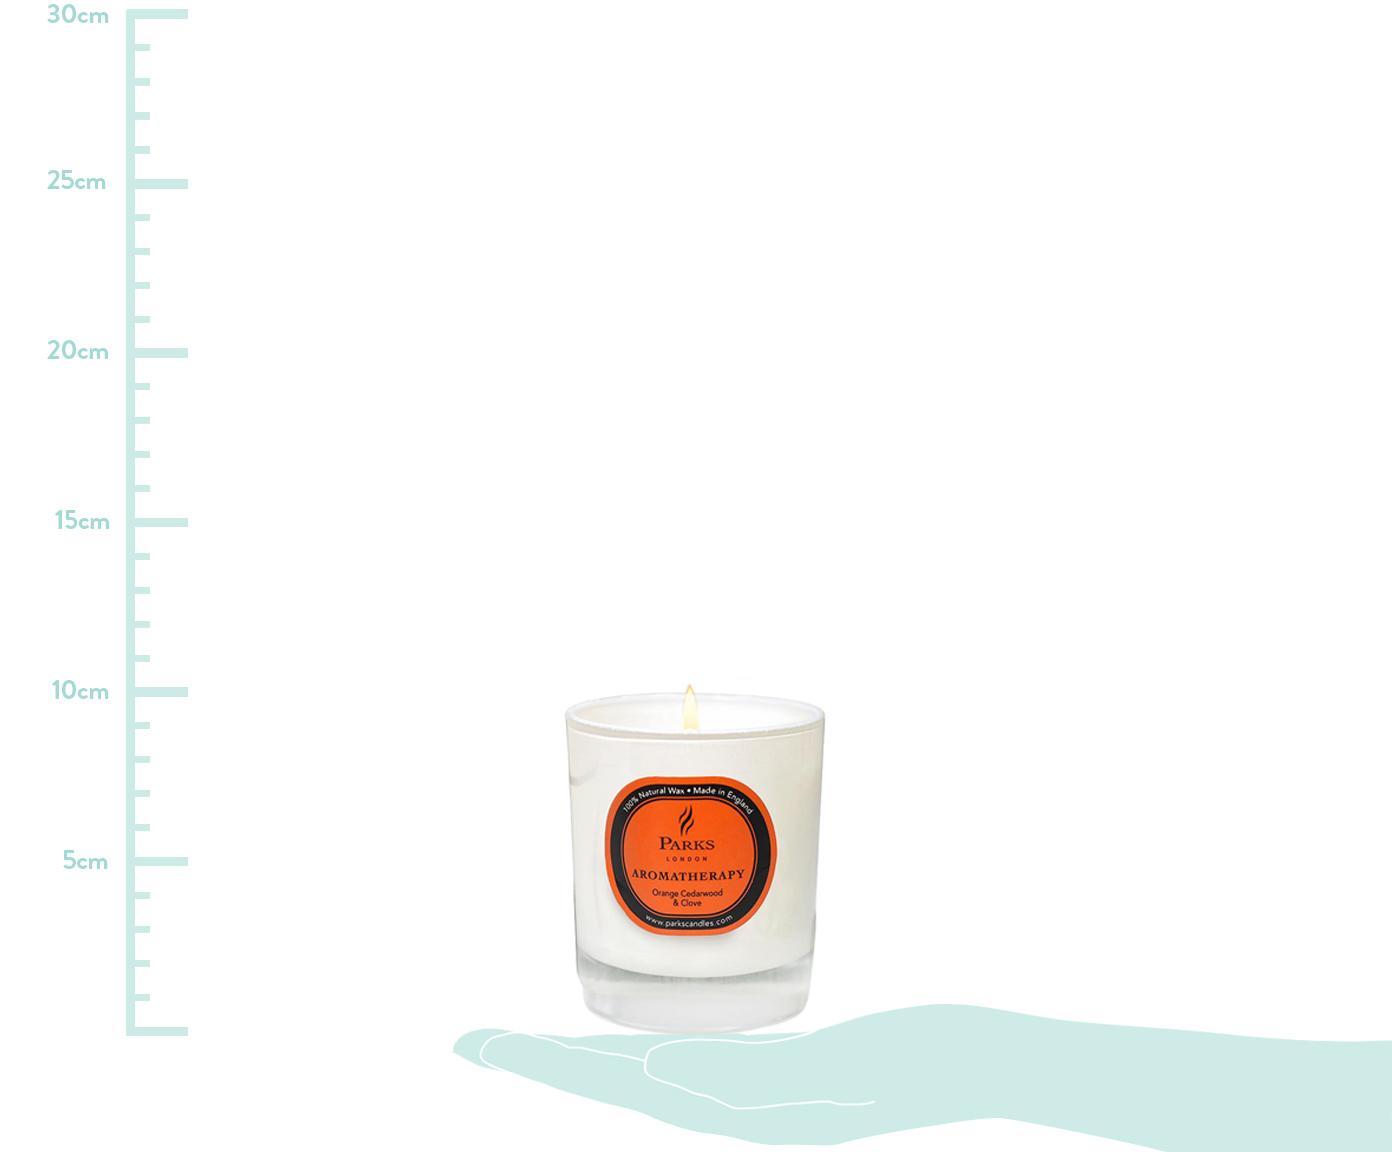 Duftkerze Aromatherapy (Orange, Zedernholz & Nelke), Behälter: Glas, Transparent, Weiß, Orange, Ø 8 x H 9 cm